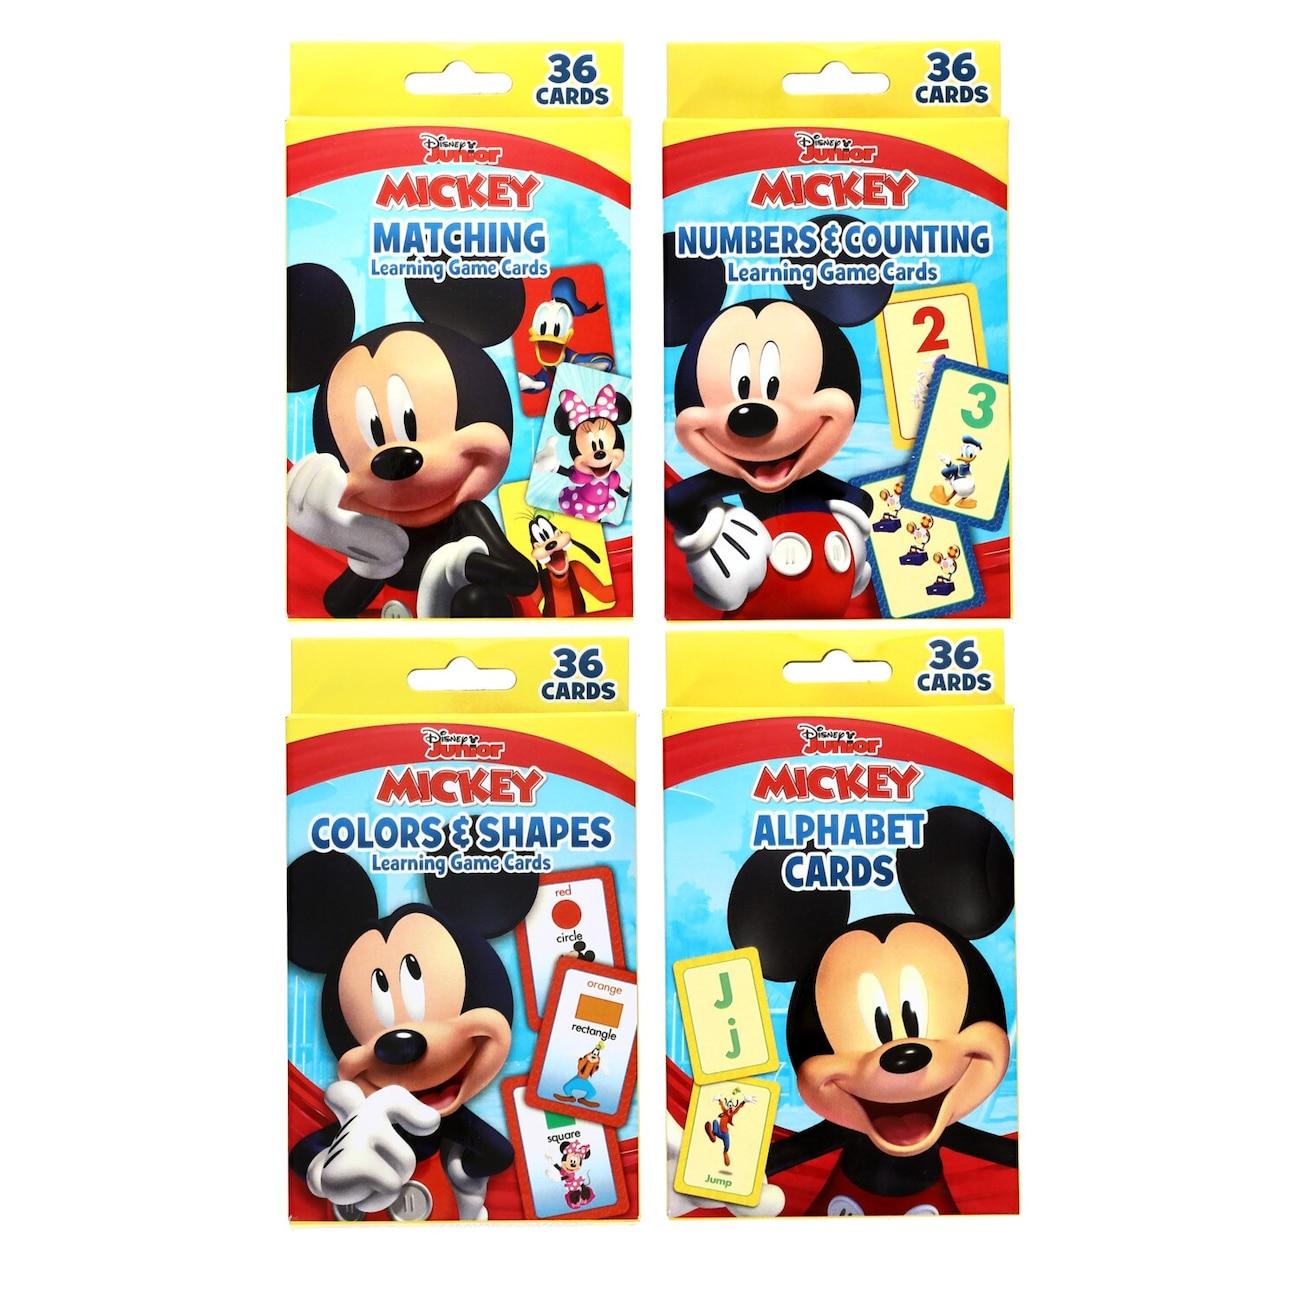 Mickey Mouse - Dollar Tree, Inc.